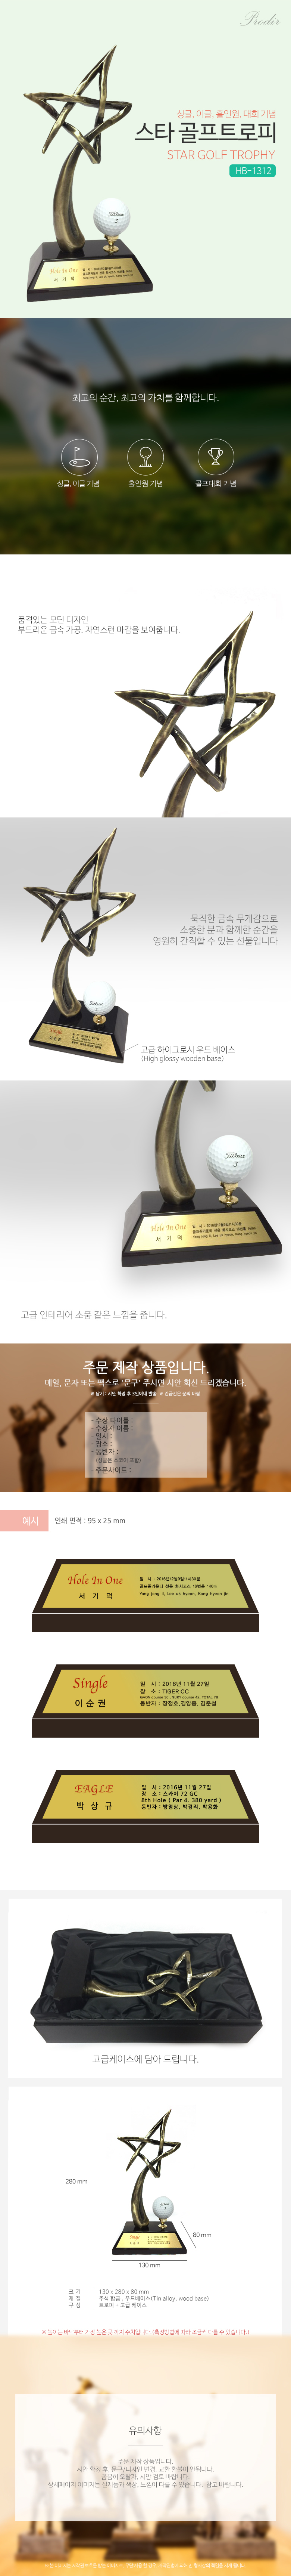 trophy_1312_star.jpg